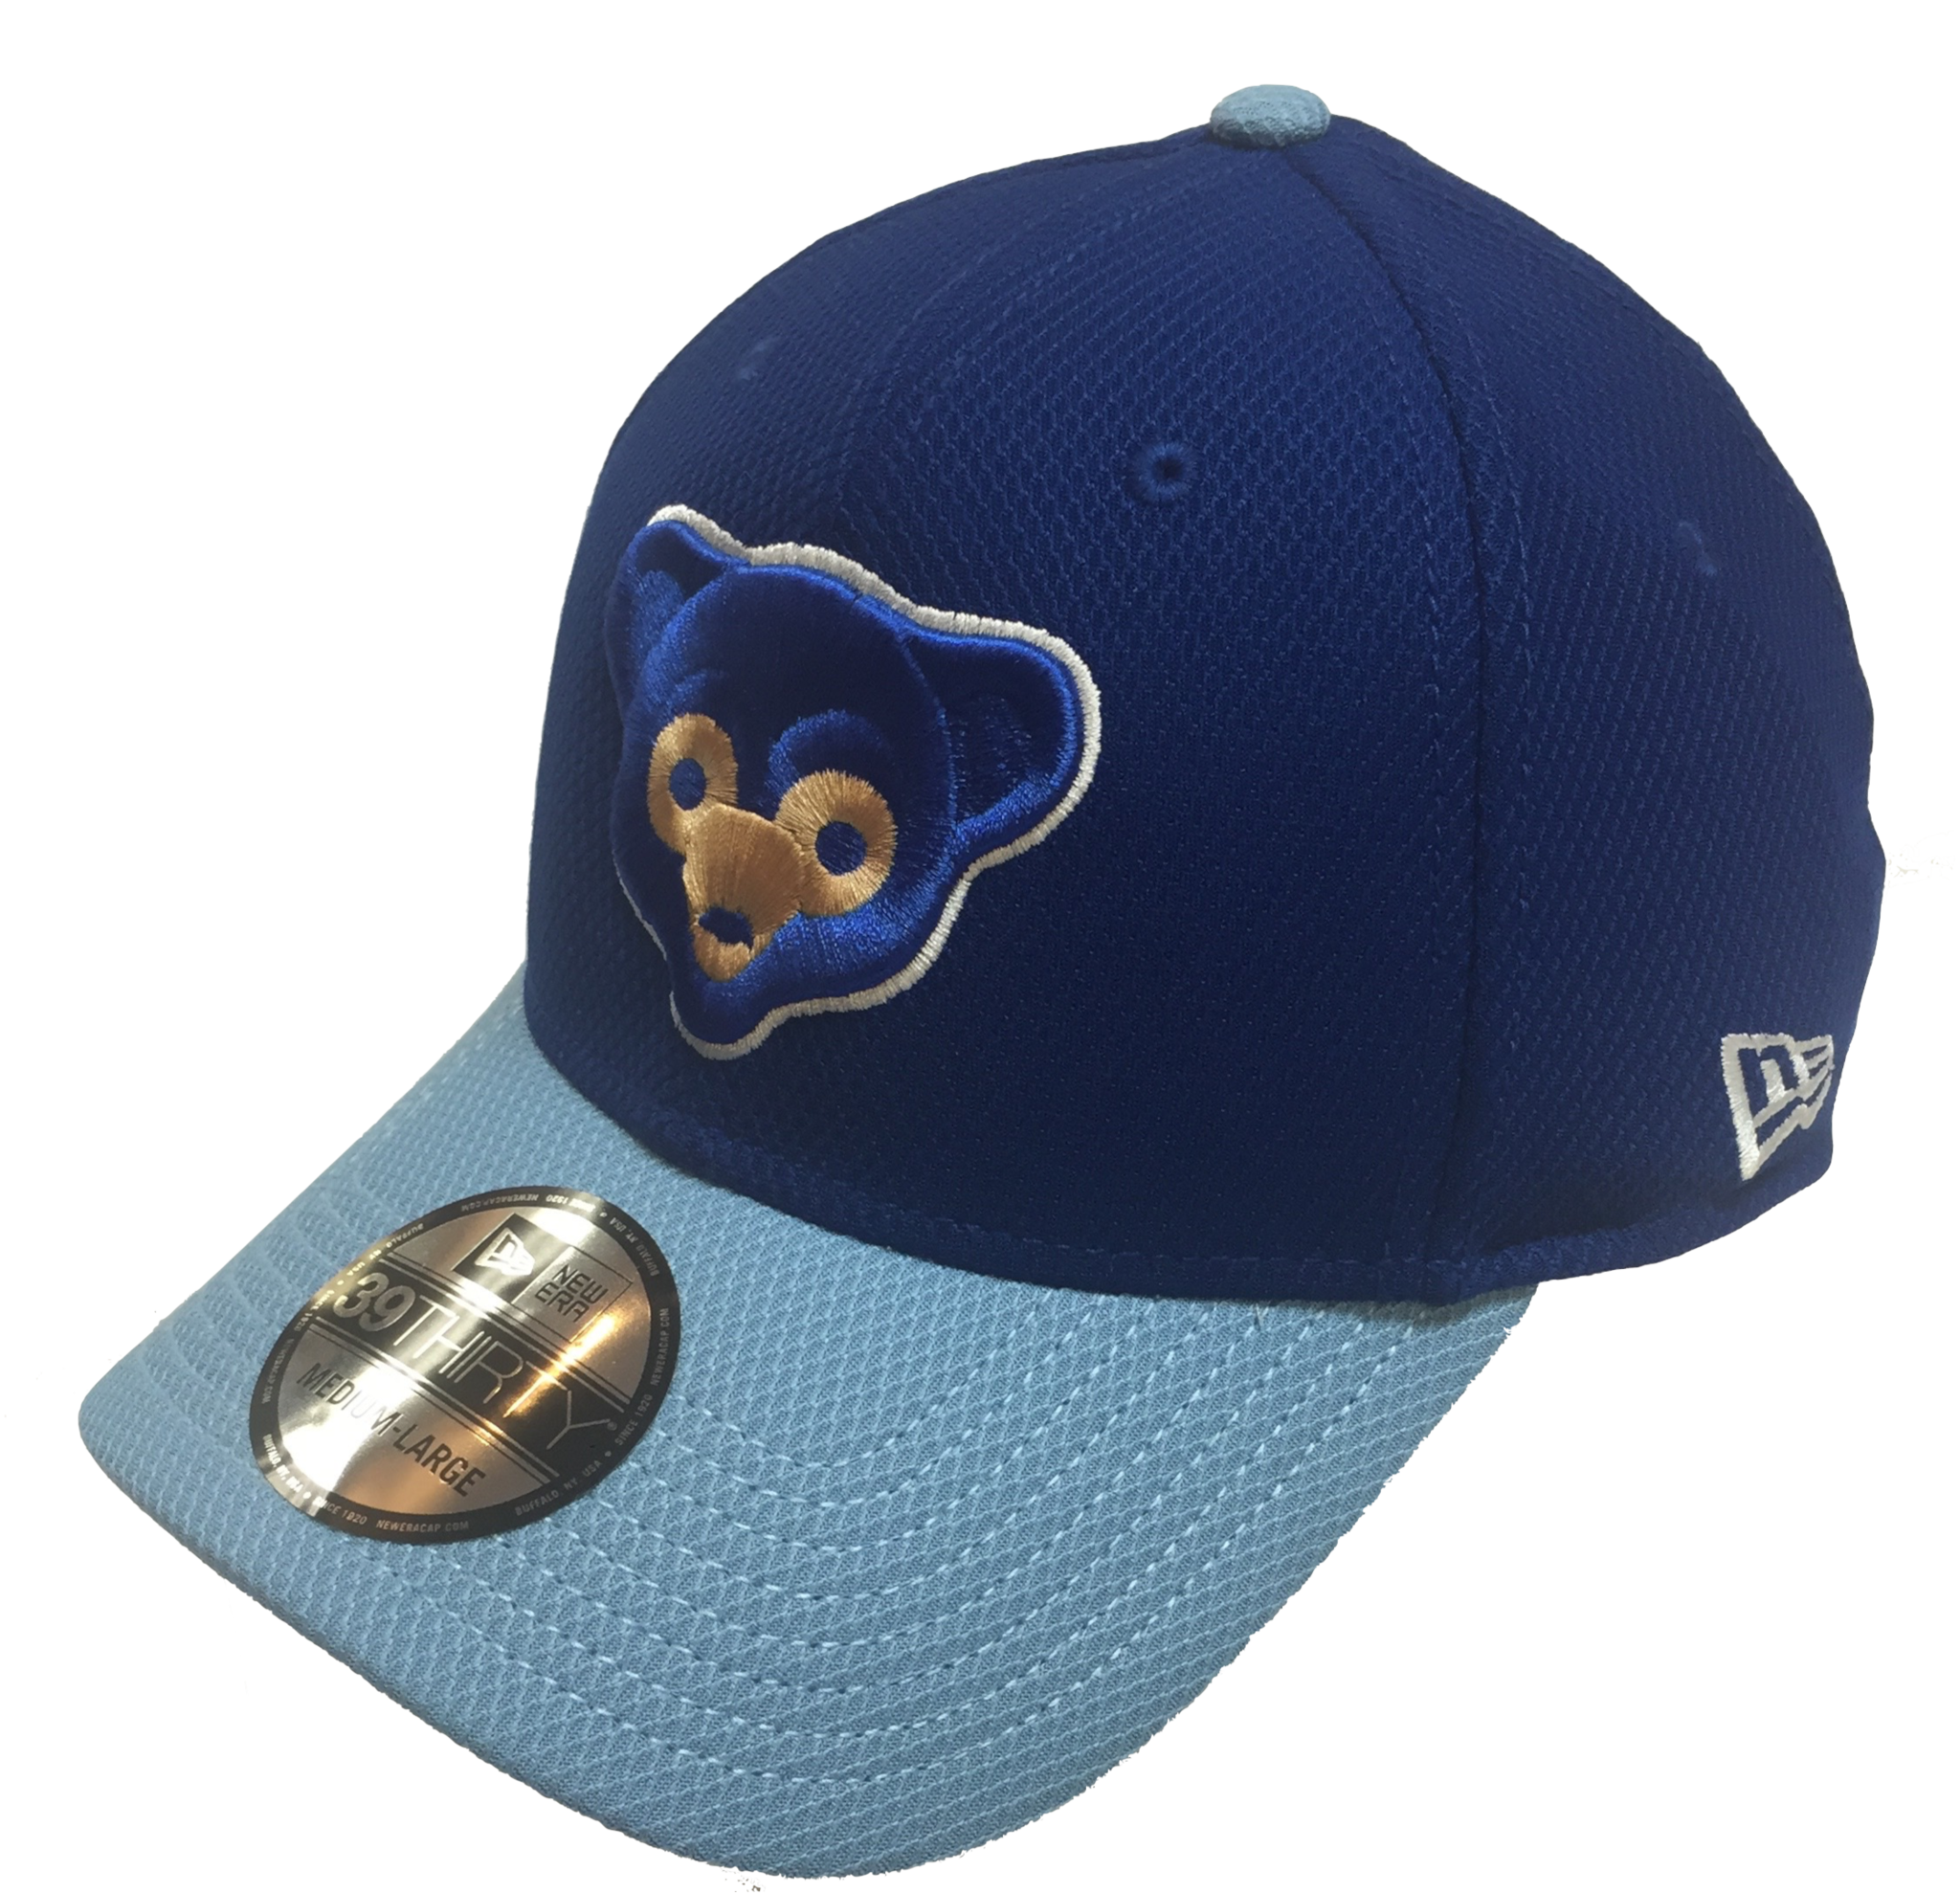 6e57704c0d9 Chicago Cubs 1969 Logo Diamond Era 39THIRTY Flex Fit Hat By New Era ...